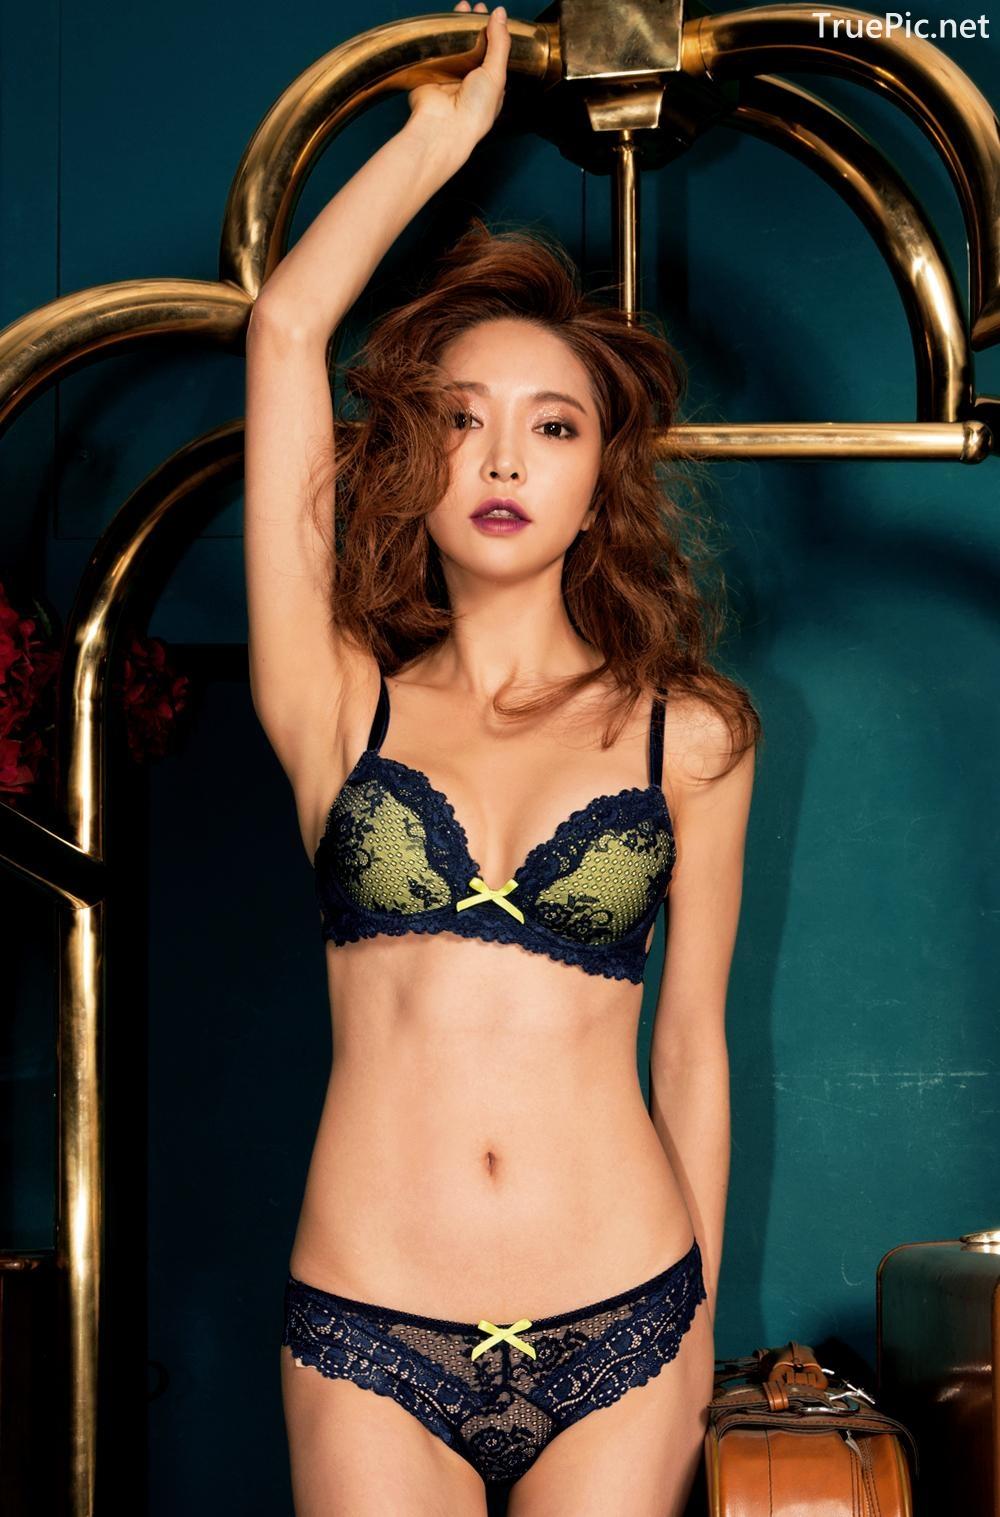 Image Korean Fashion Model - Park Soo Yeon - BVB Black Lace Lingerie - TruePic.net - Picture-6